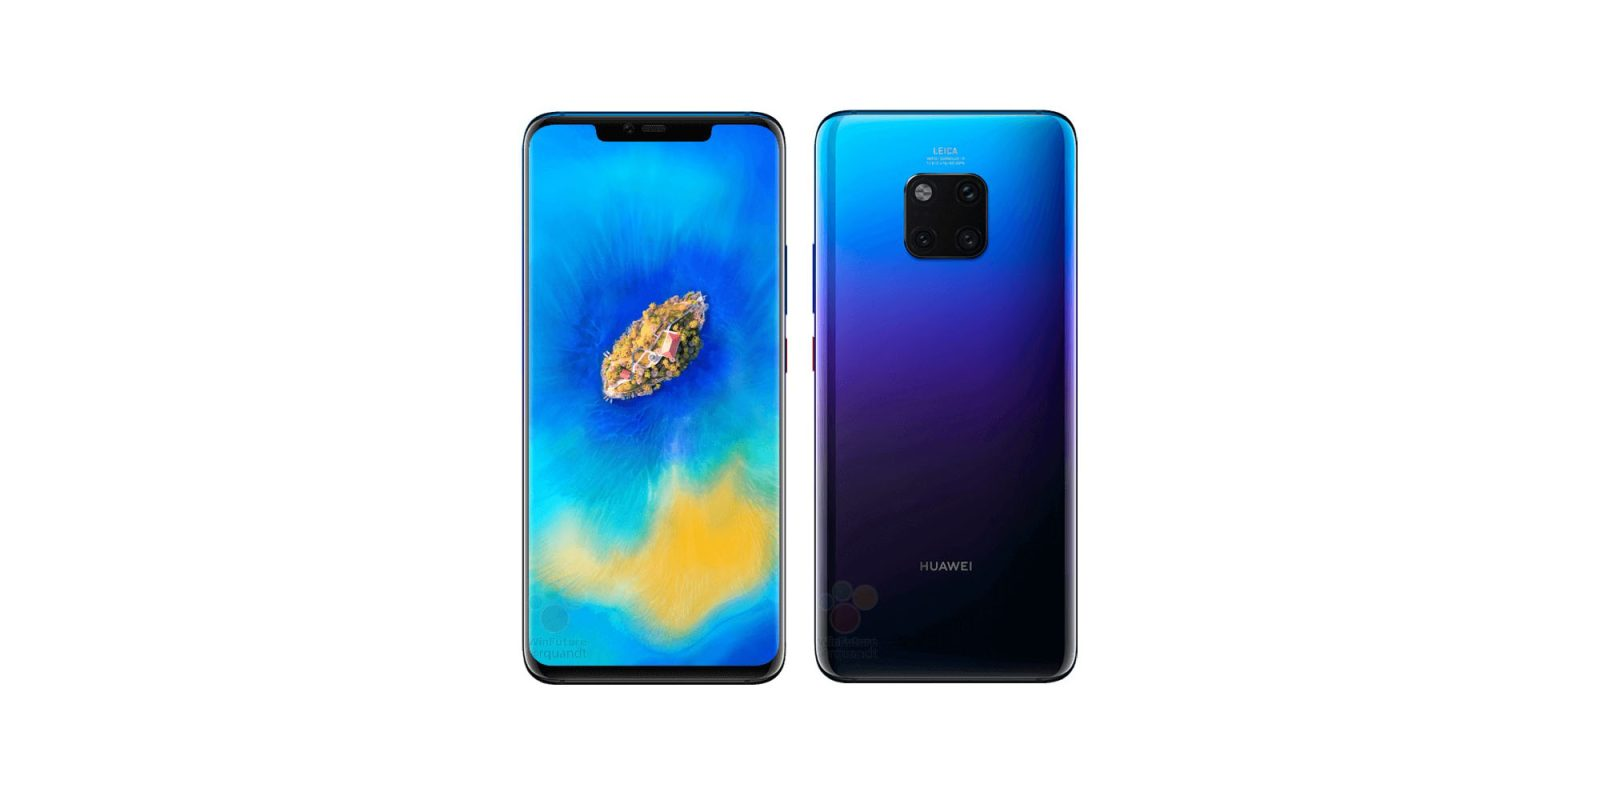 Huawei Mate 20 y Mate 20 Pro llegan a México con Telcel